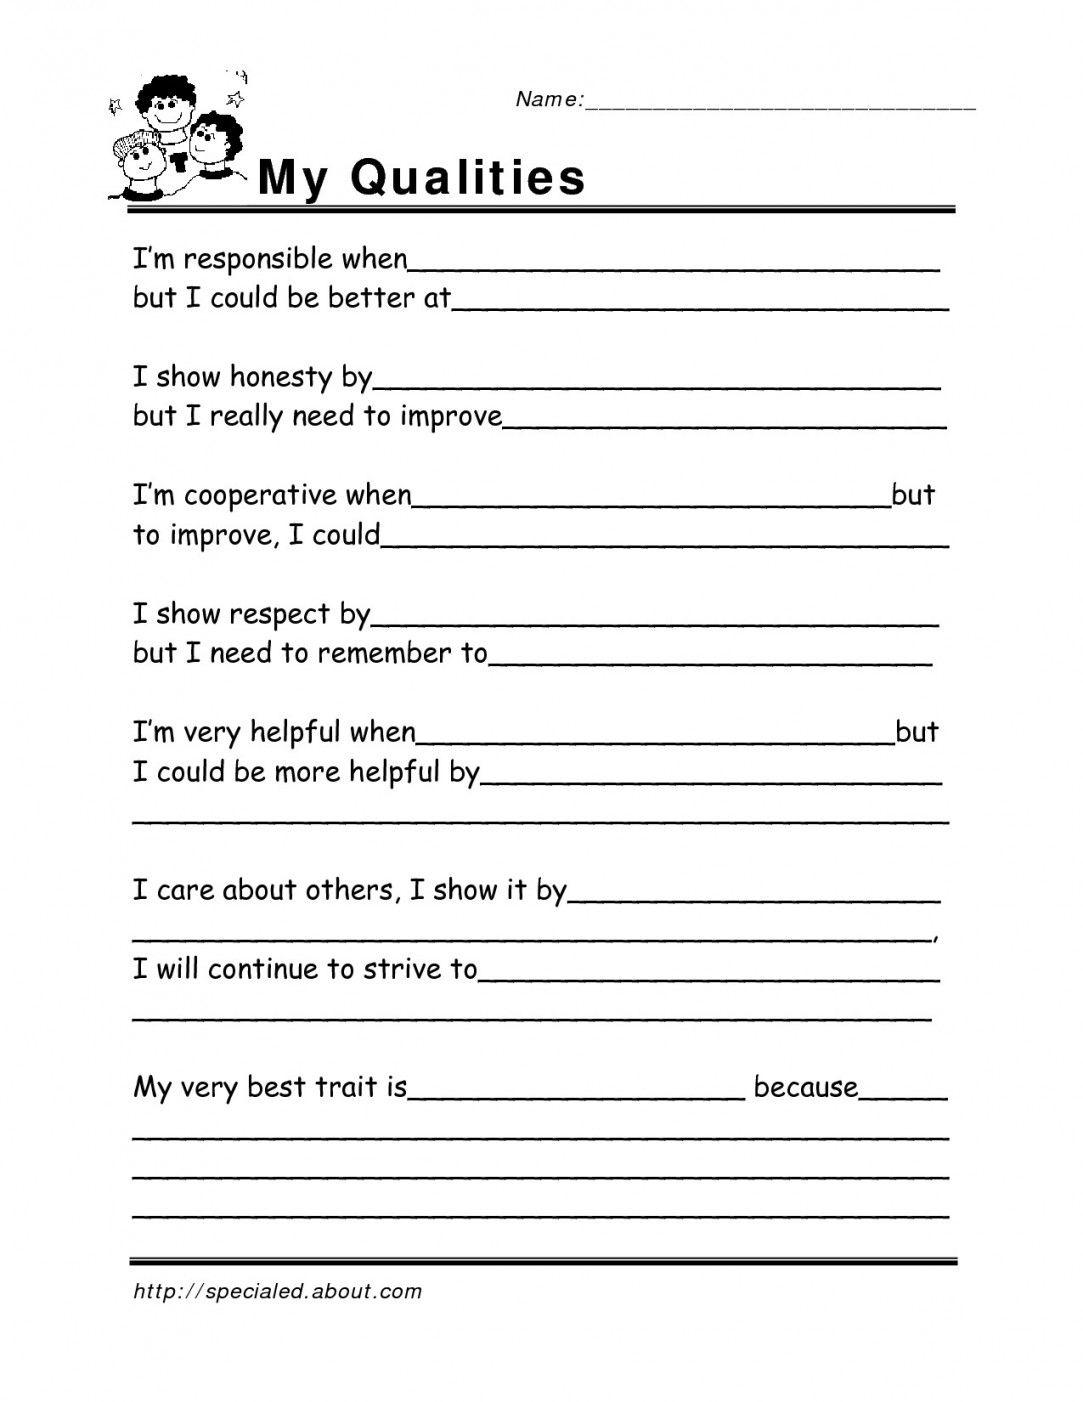 Free Printable Life Skills Worksheets For Adults | Lostranquillos | Printable Worksheets For Adults